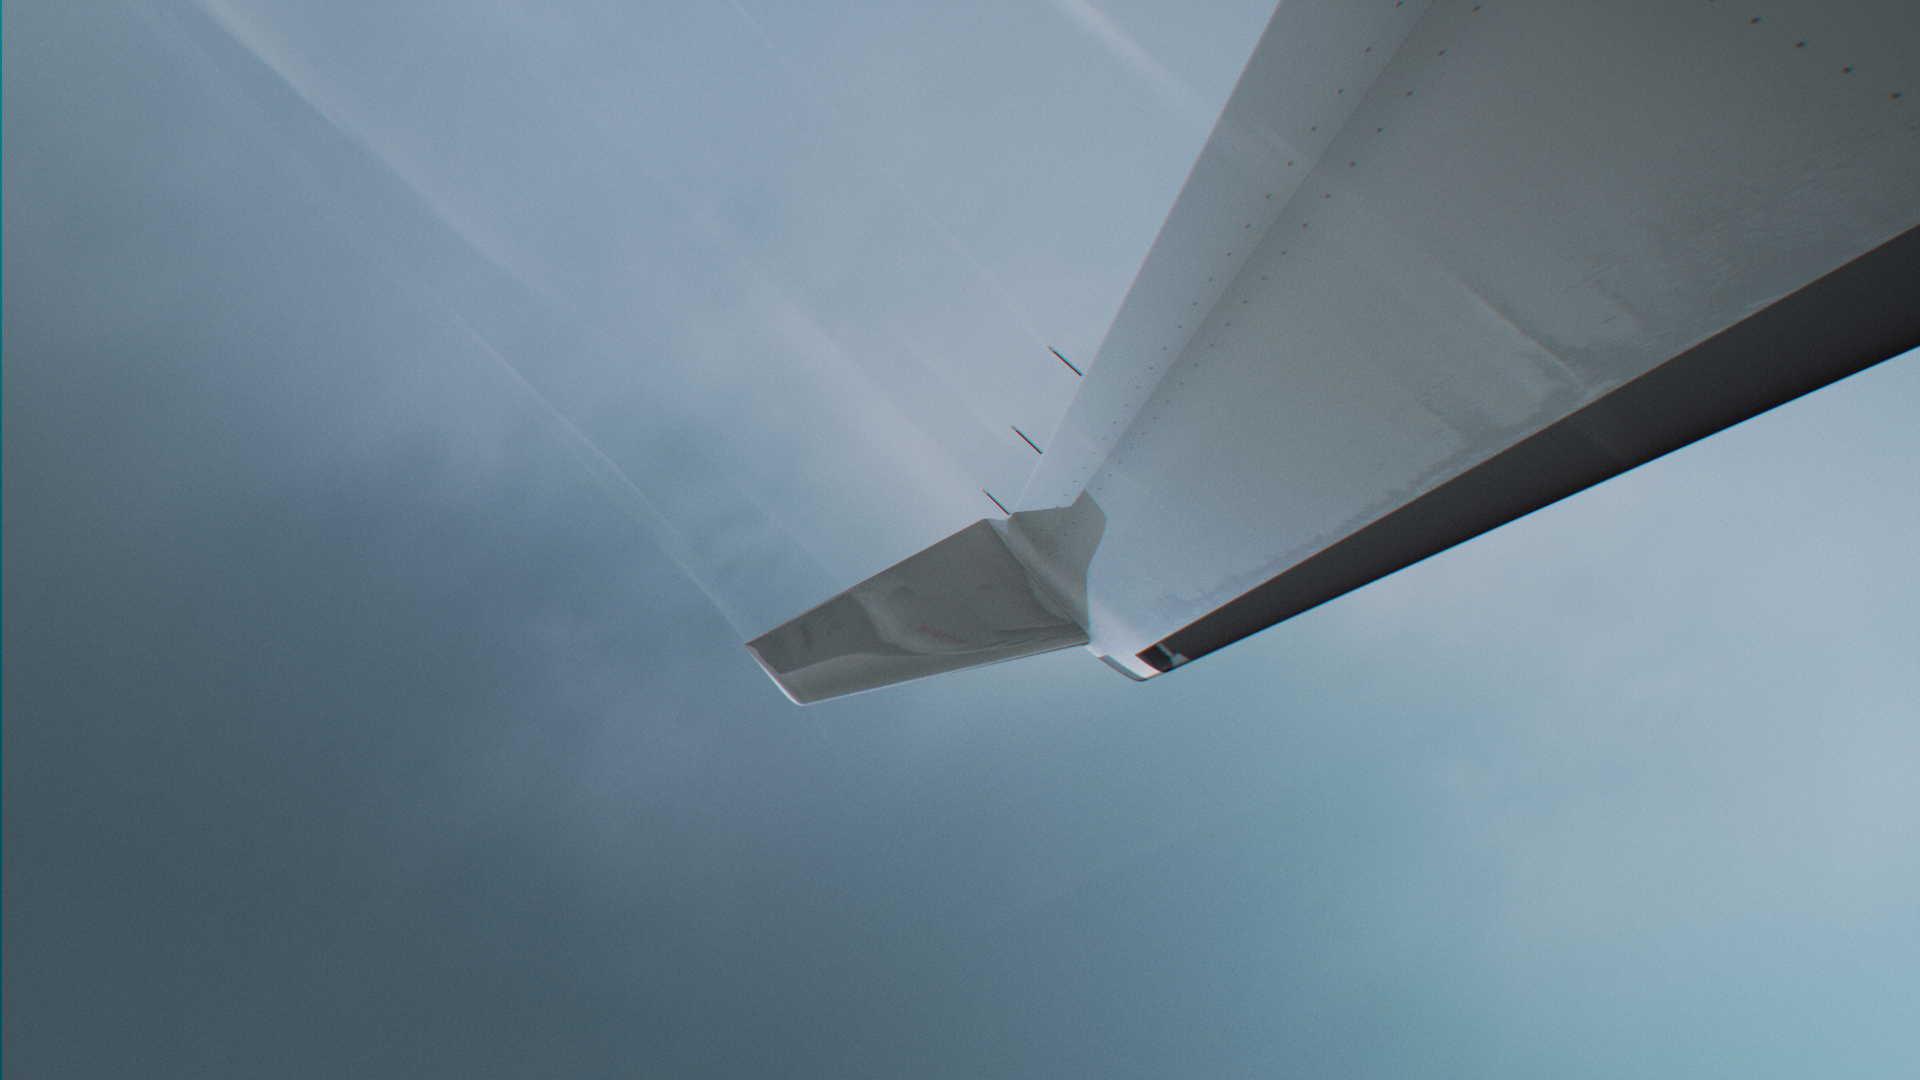 05_Hondajet-JC-2.jpg